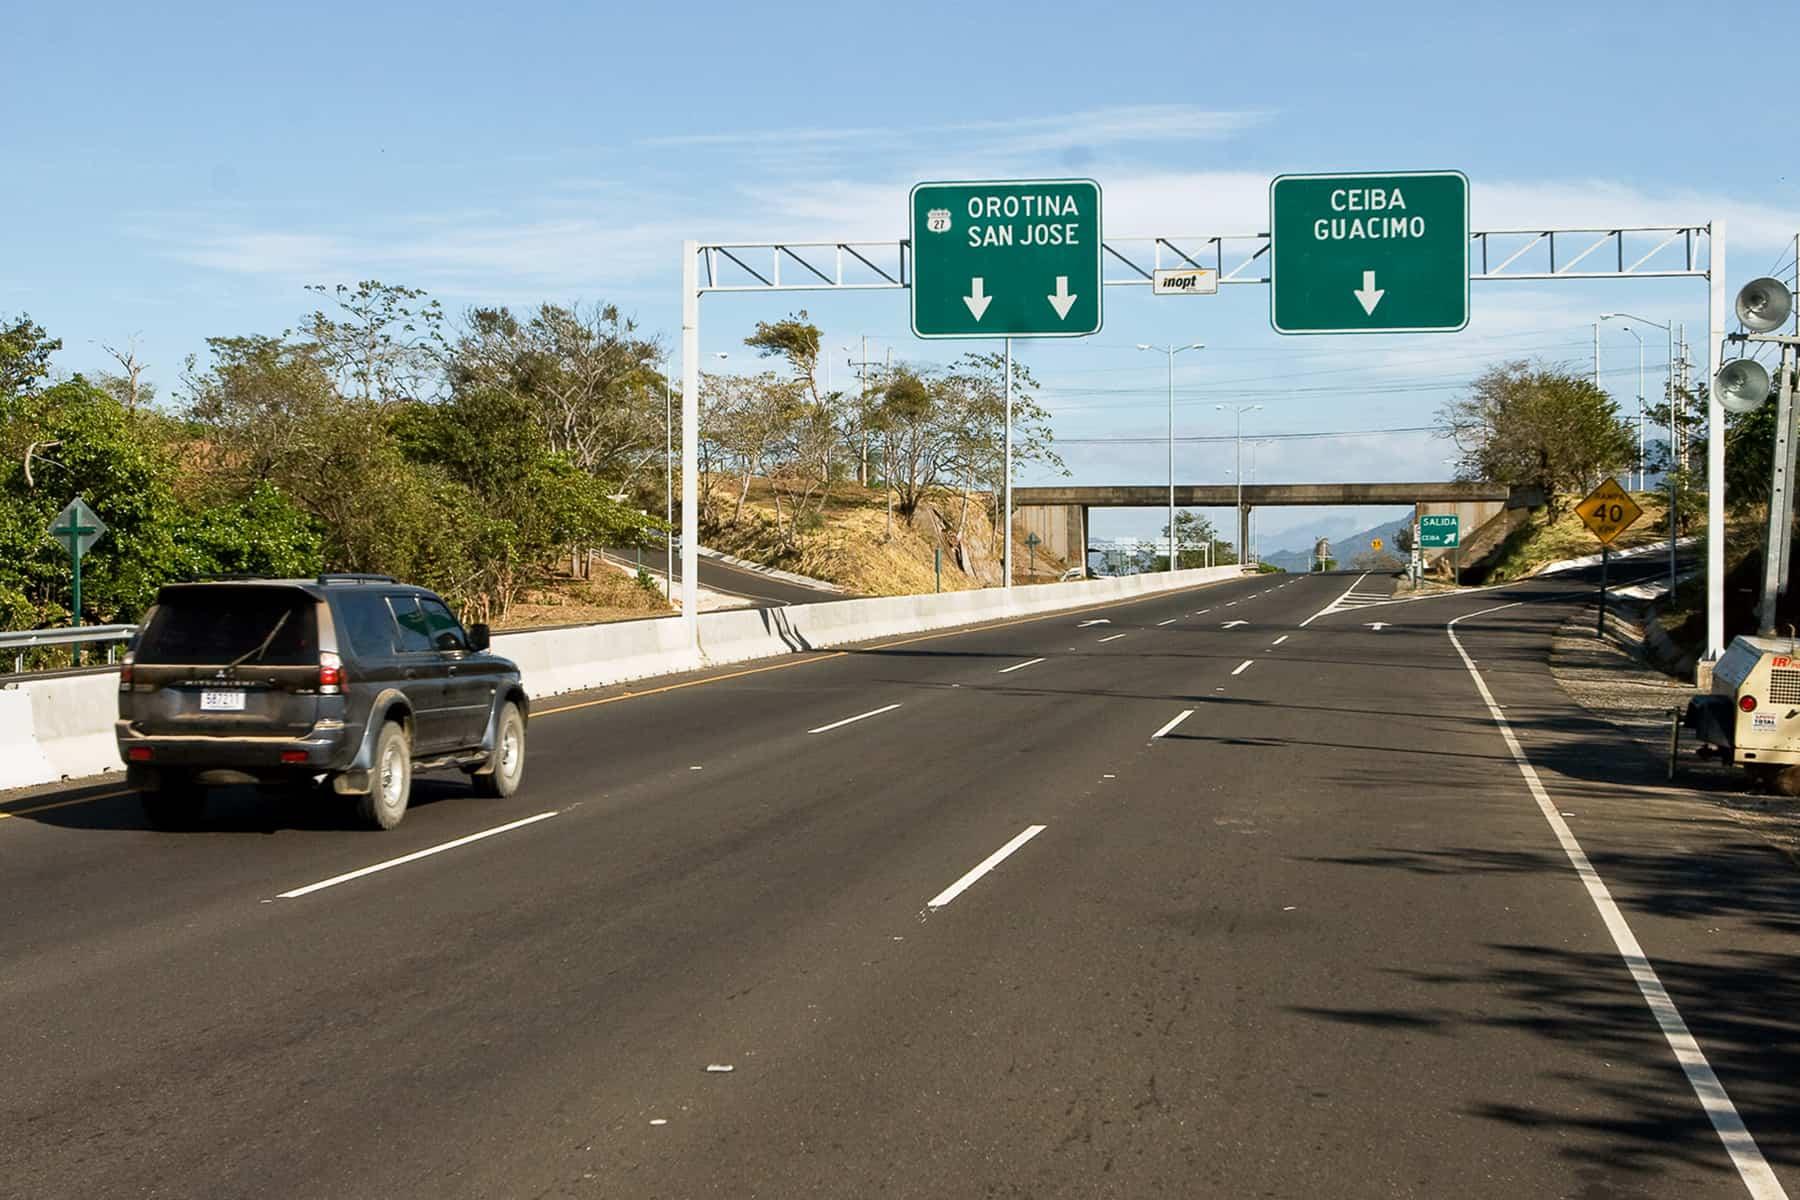 Route 27 San José-Puntarenas